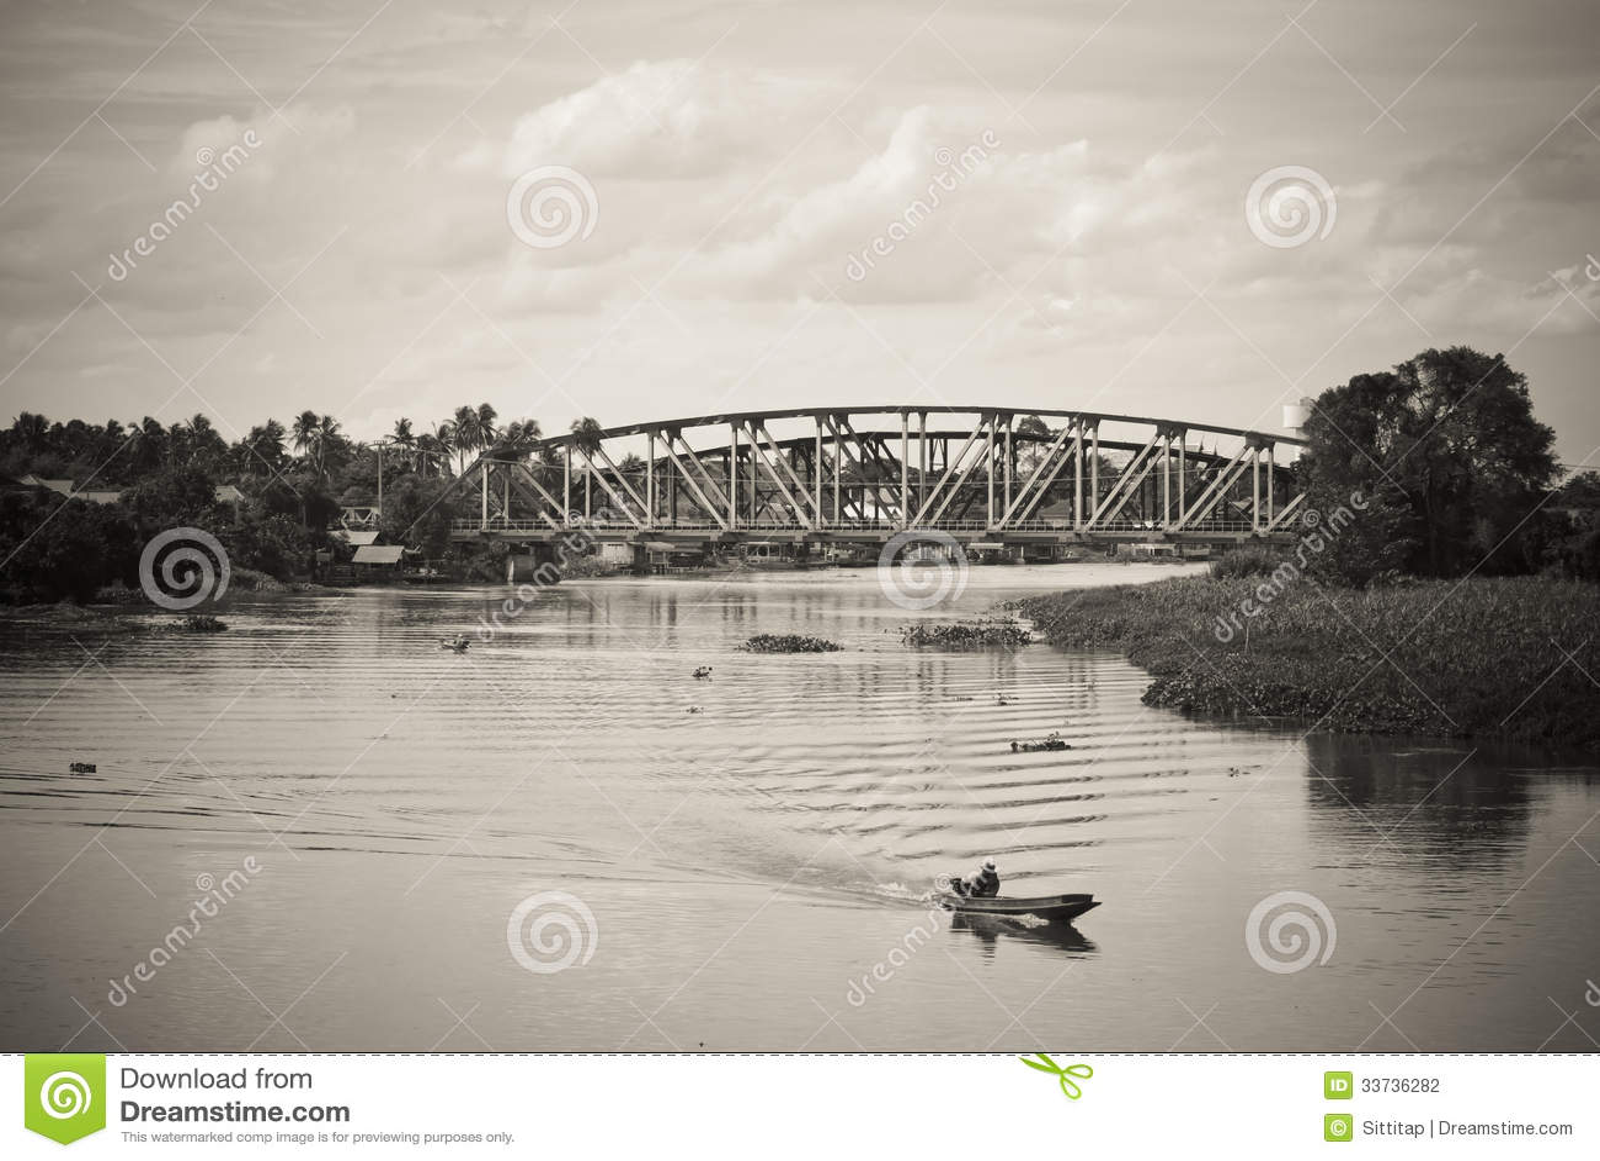 Мост поперек